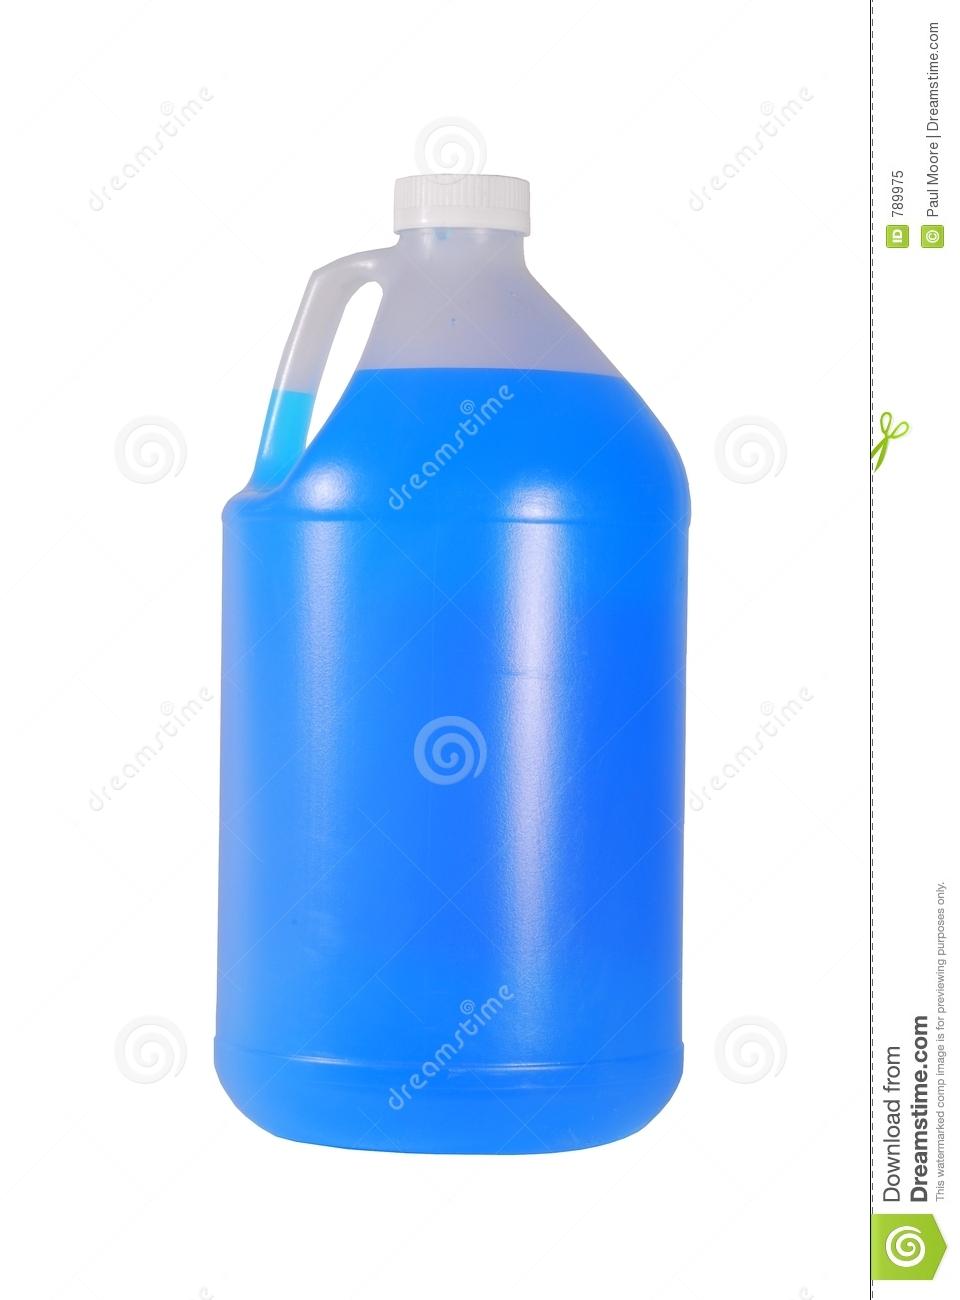 Milk Jug clipart gallon water Images Clipart milk%20gallon%20clipart Clipart Gallon